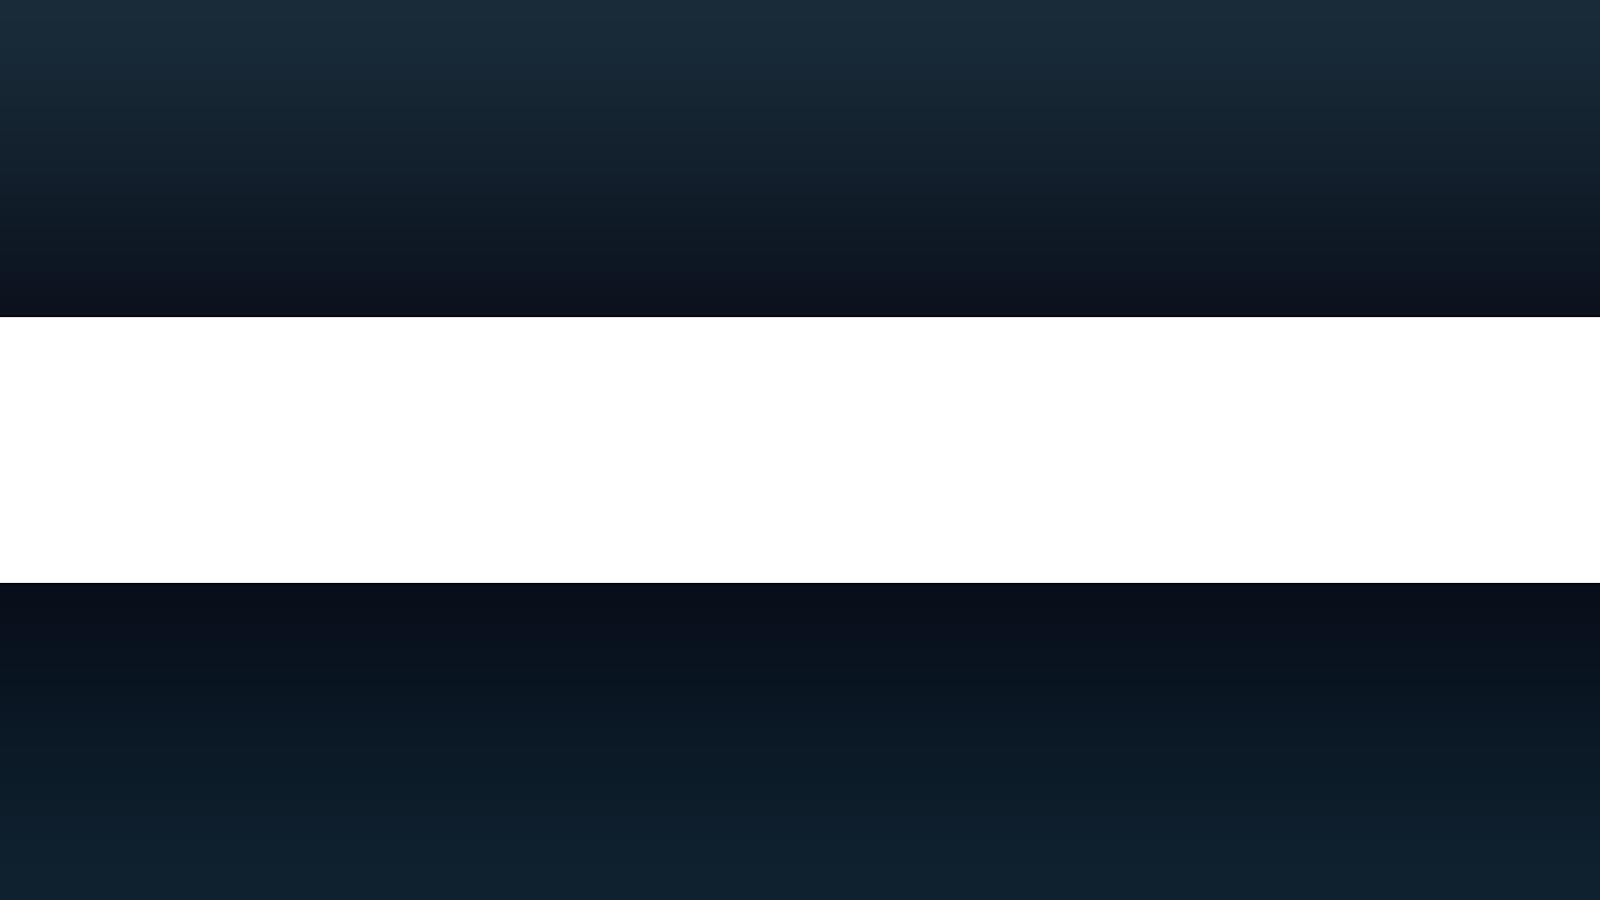 Capa De Youtube 2048x1152: Como Criar BANNER Para Canal Do YouTube Pelo Celular